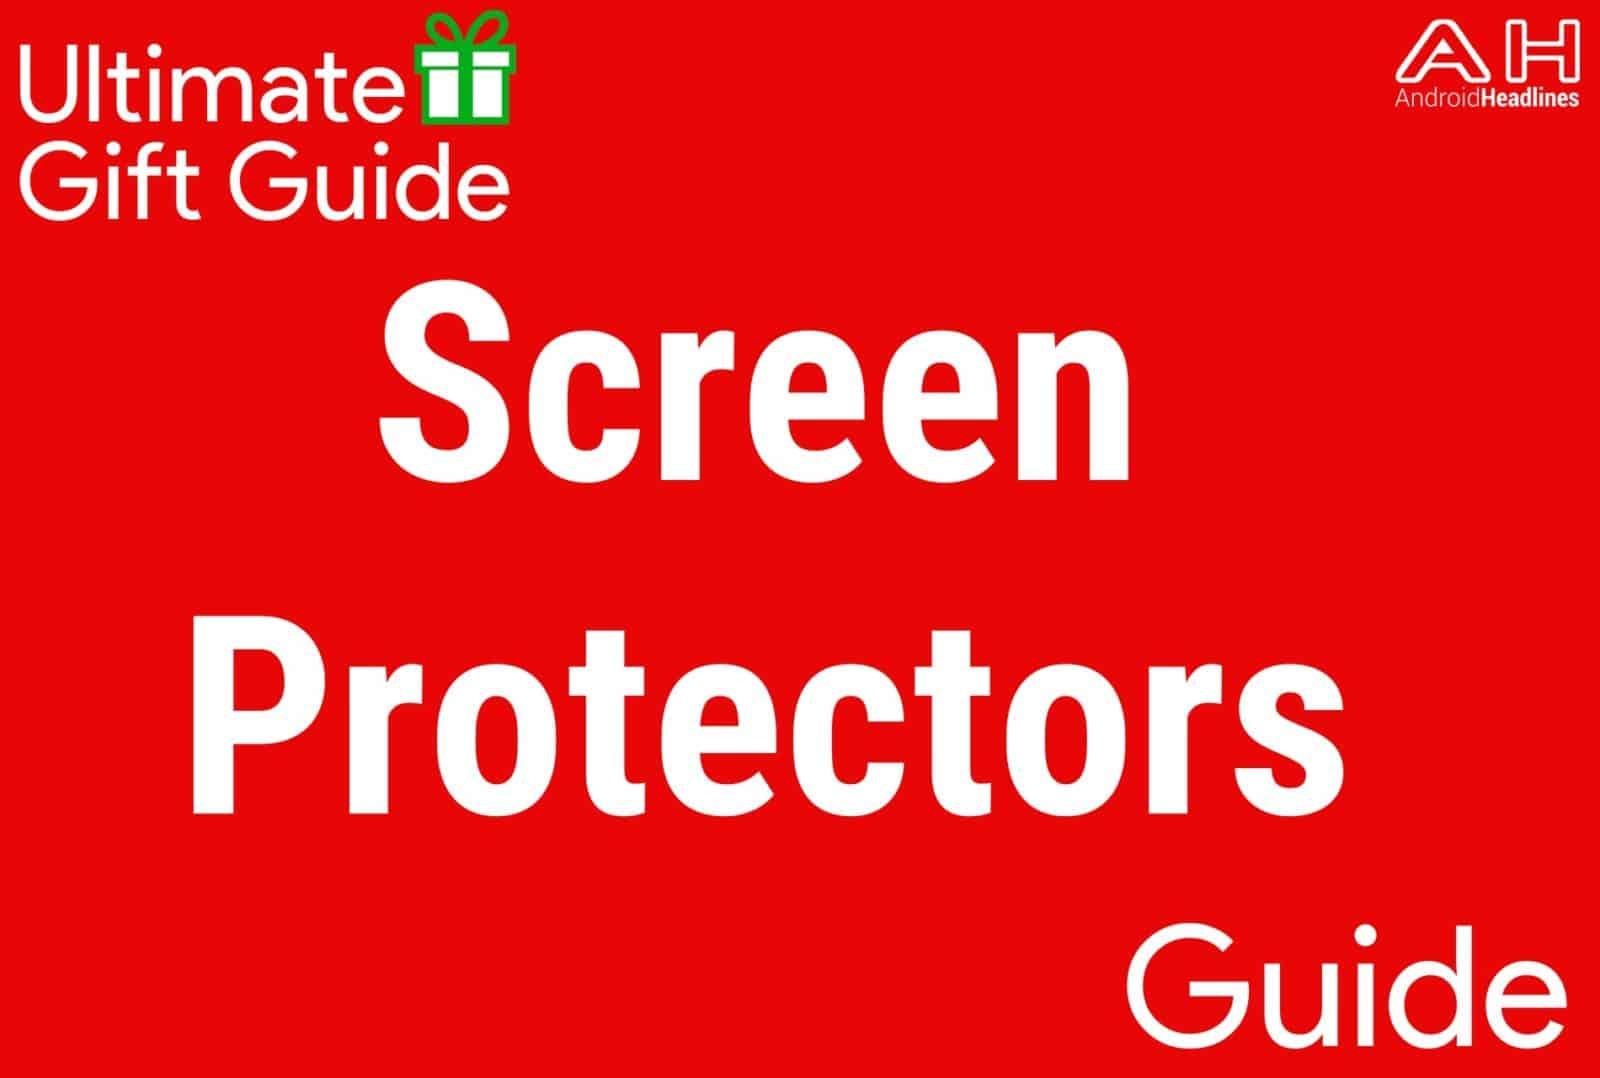 Screen Protectors - Gift Guide 2015